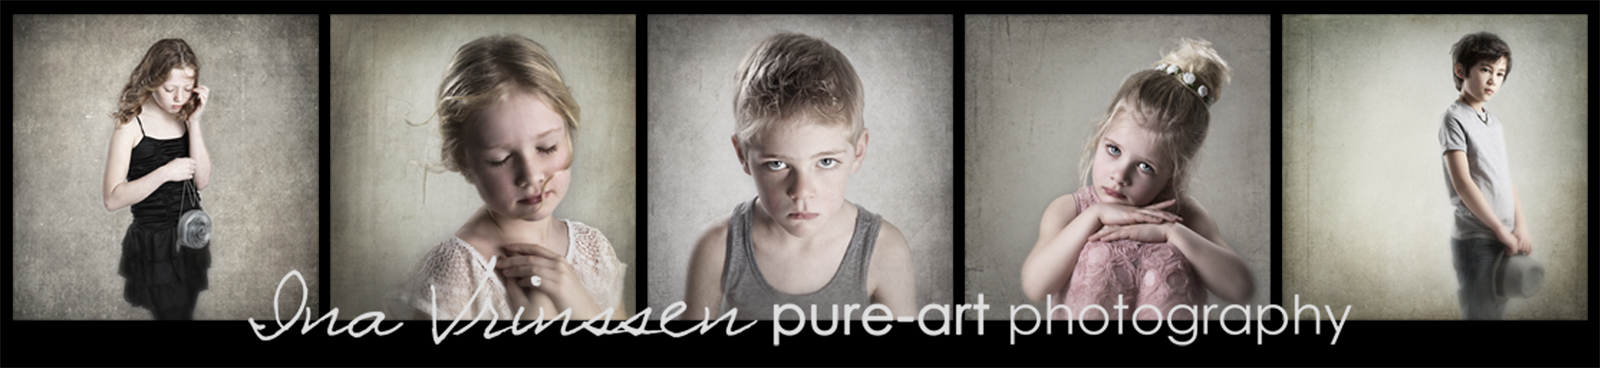 Pure art Photography